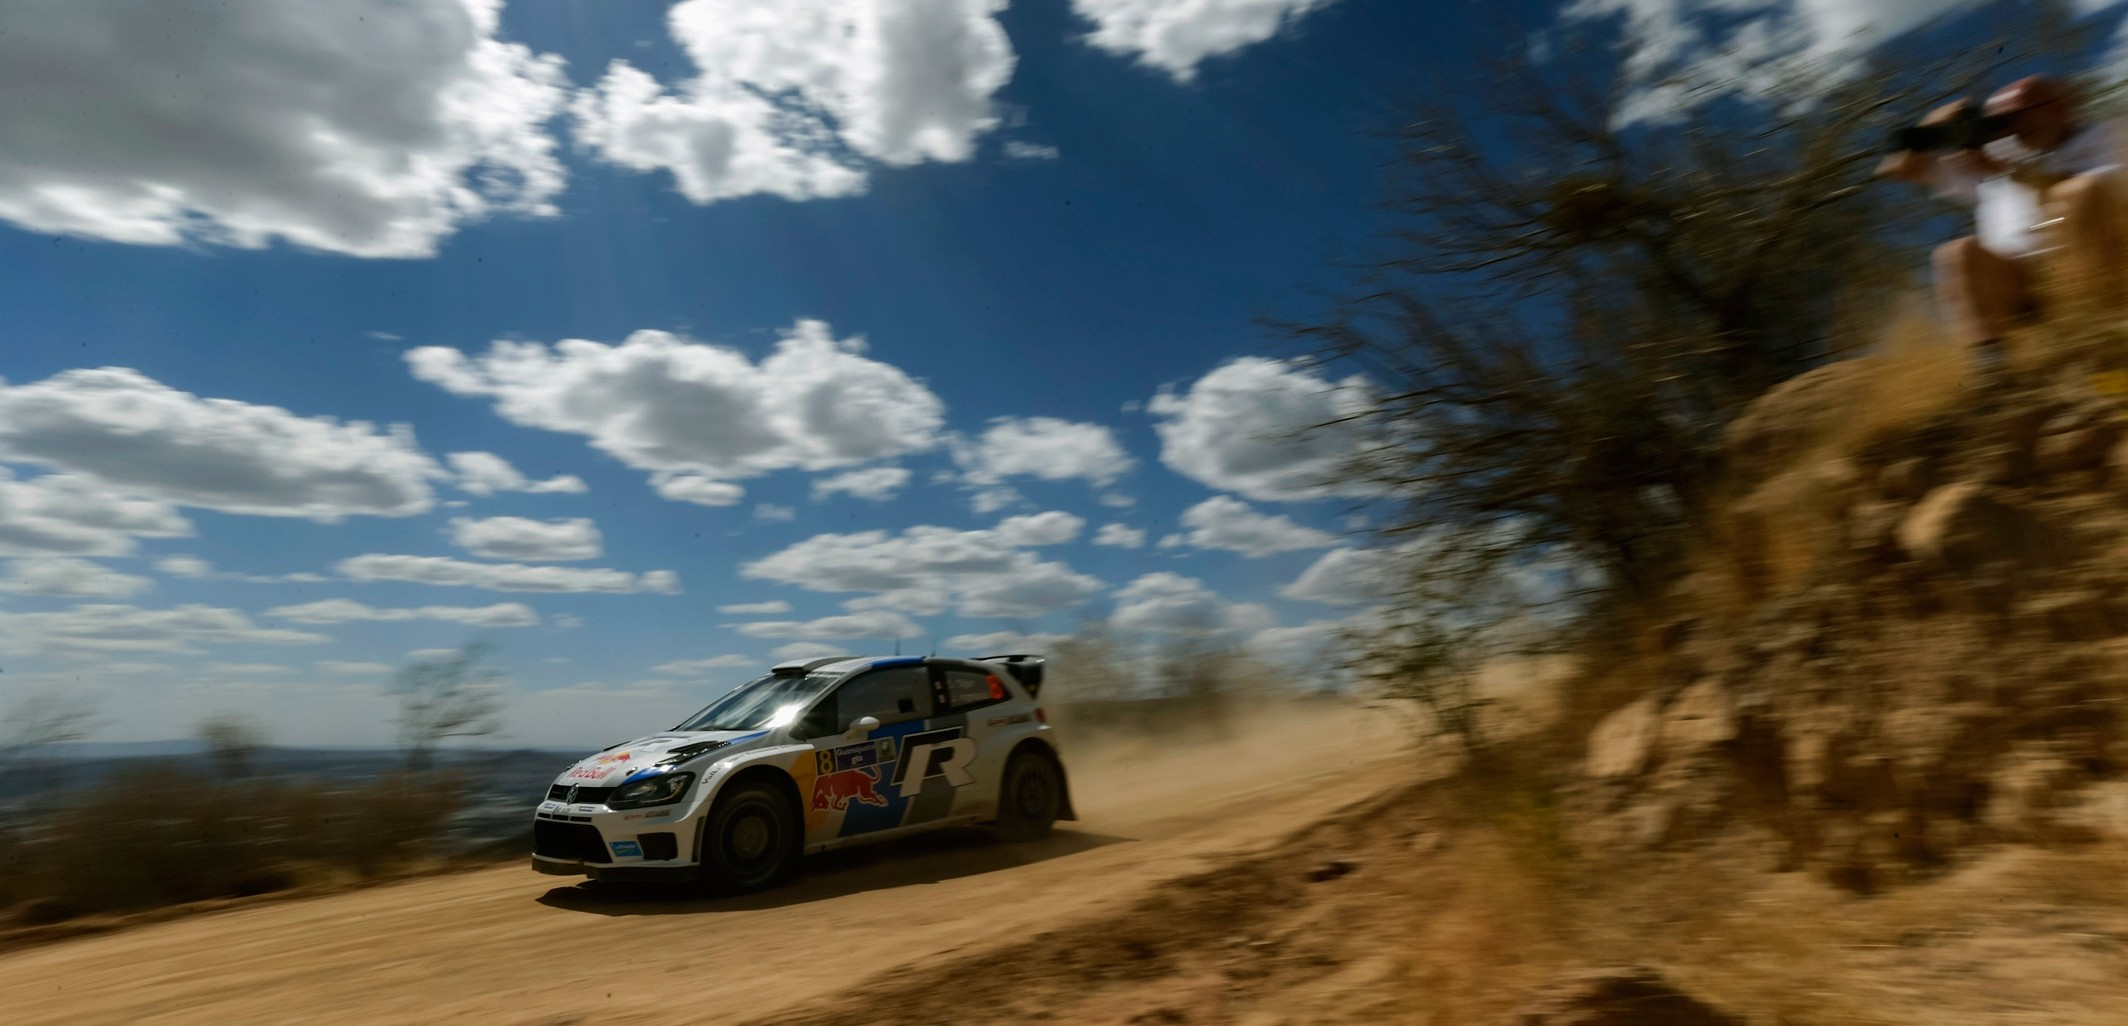 VW-WRC13-03-BK1-2671